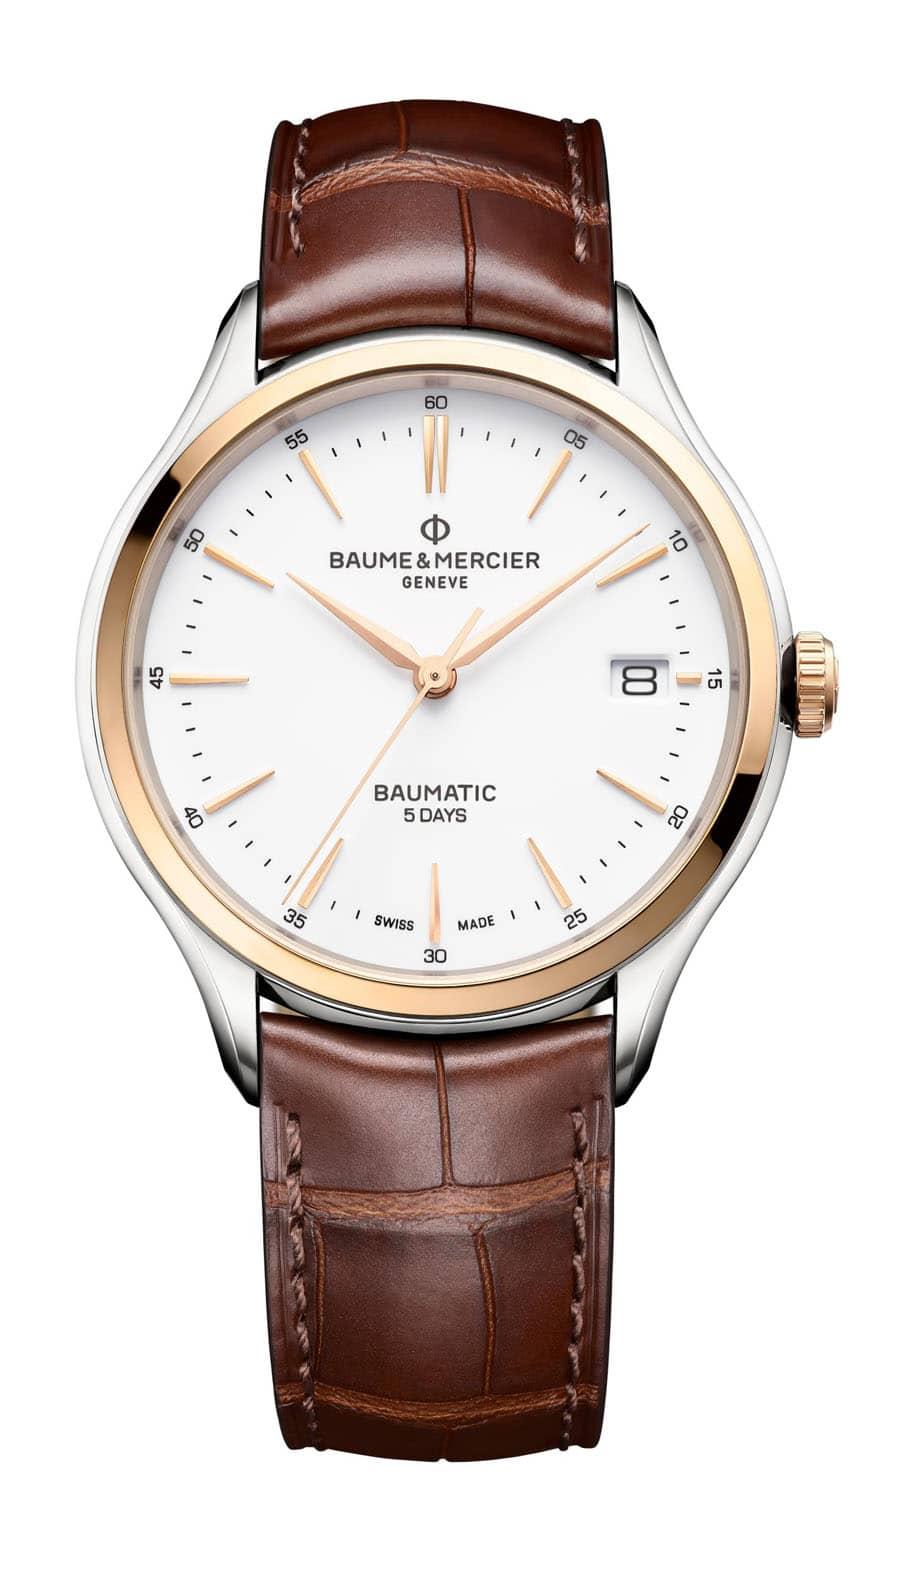 Baume & Mercier: Clifton Baumatic zweifarbig mit braunem Lederband